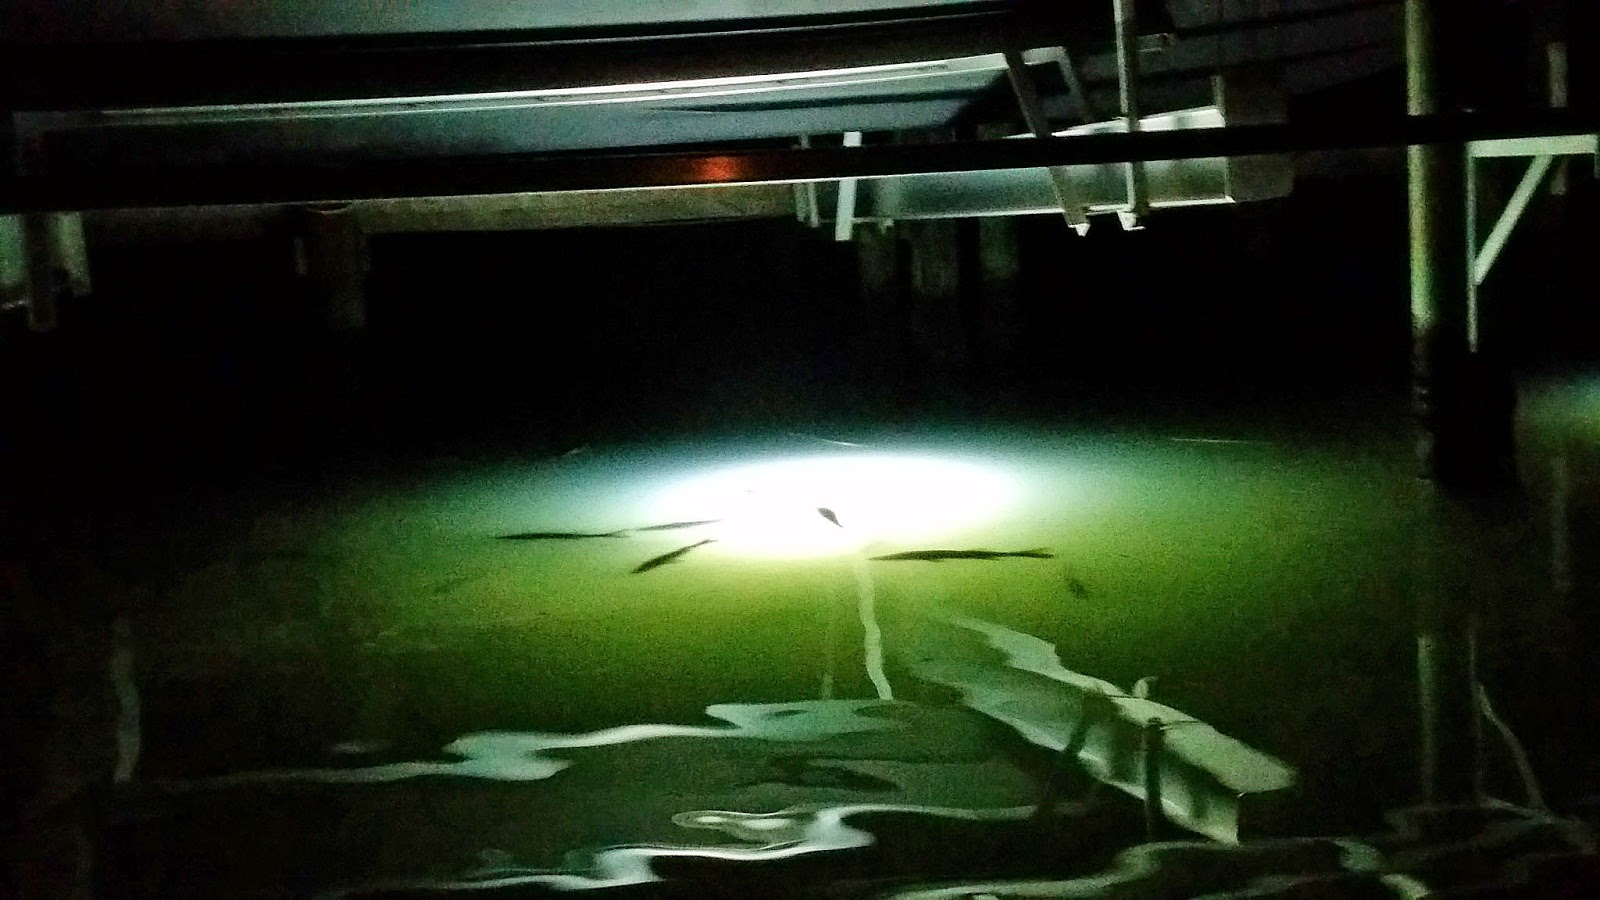 southern kayak kronicles: night fishing produced snook, tarpon, Reel Combo